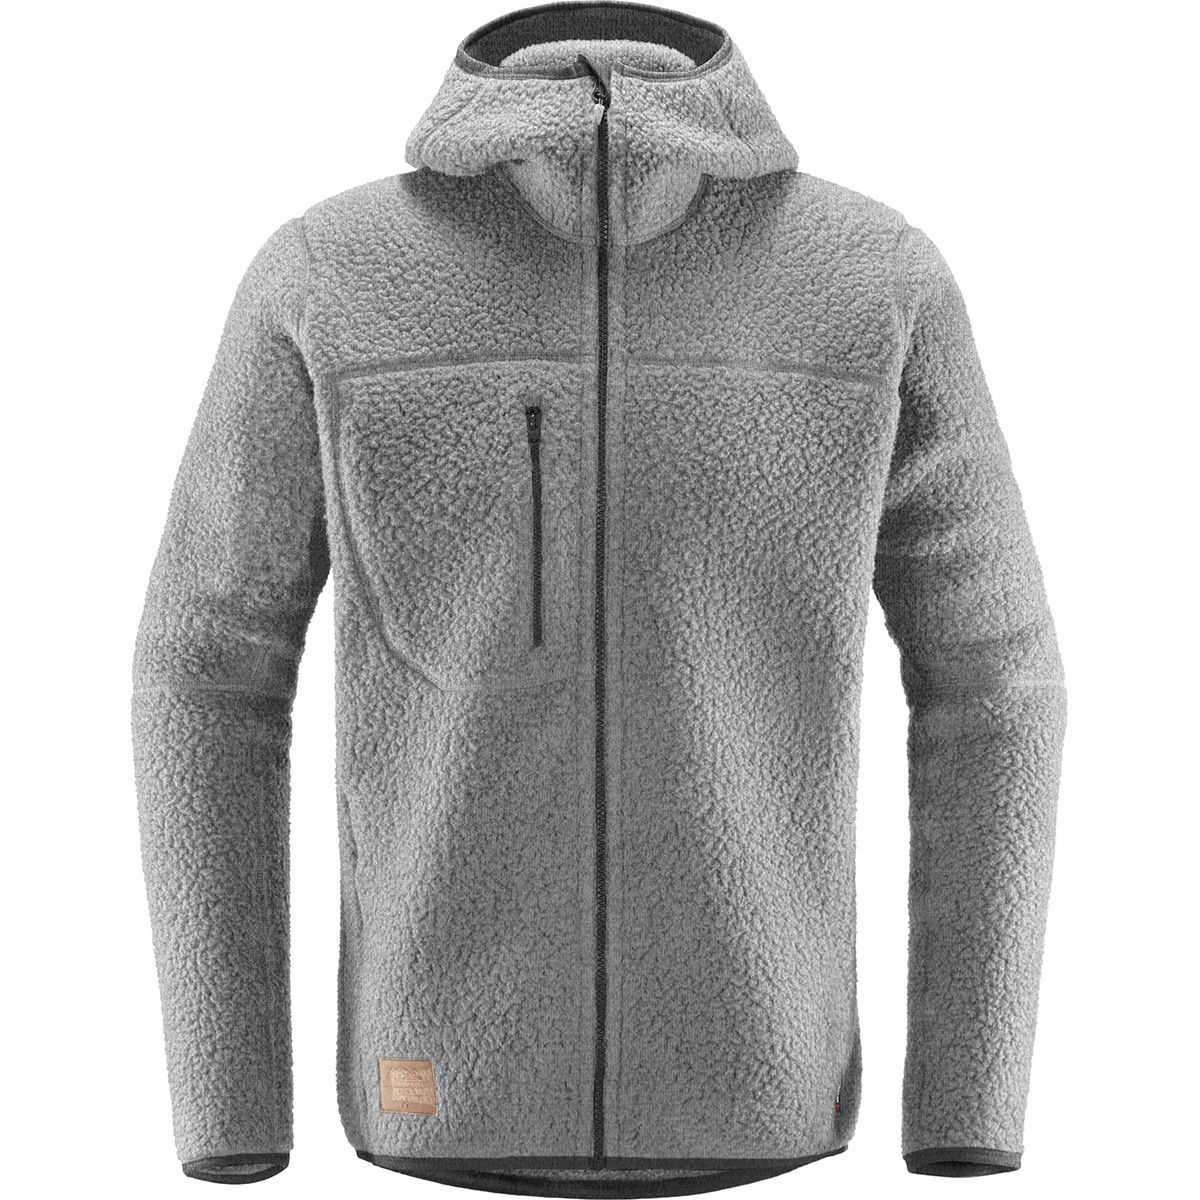 Haglofs Pile Hooded Fleece Jacket - Men's